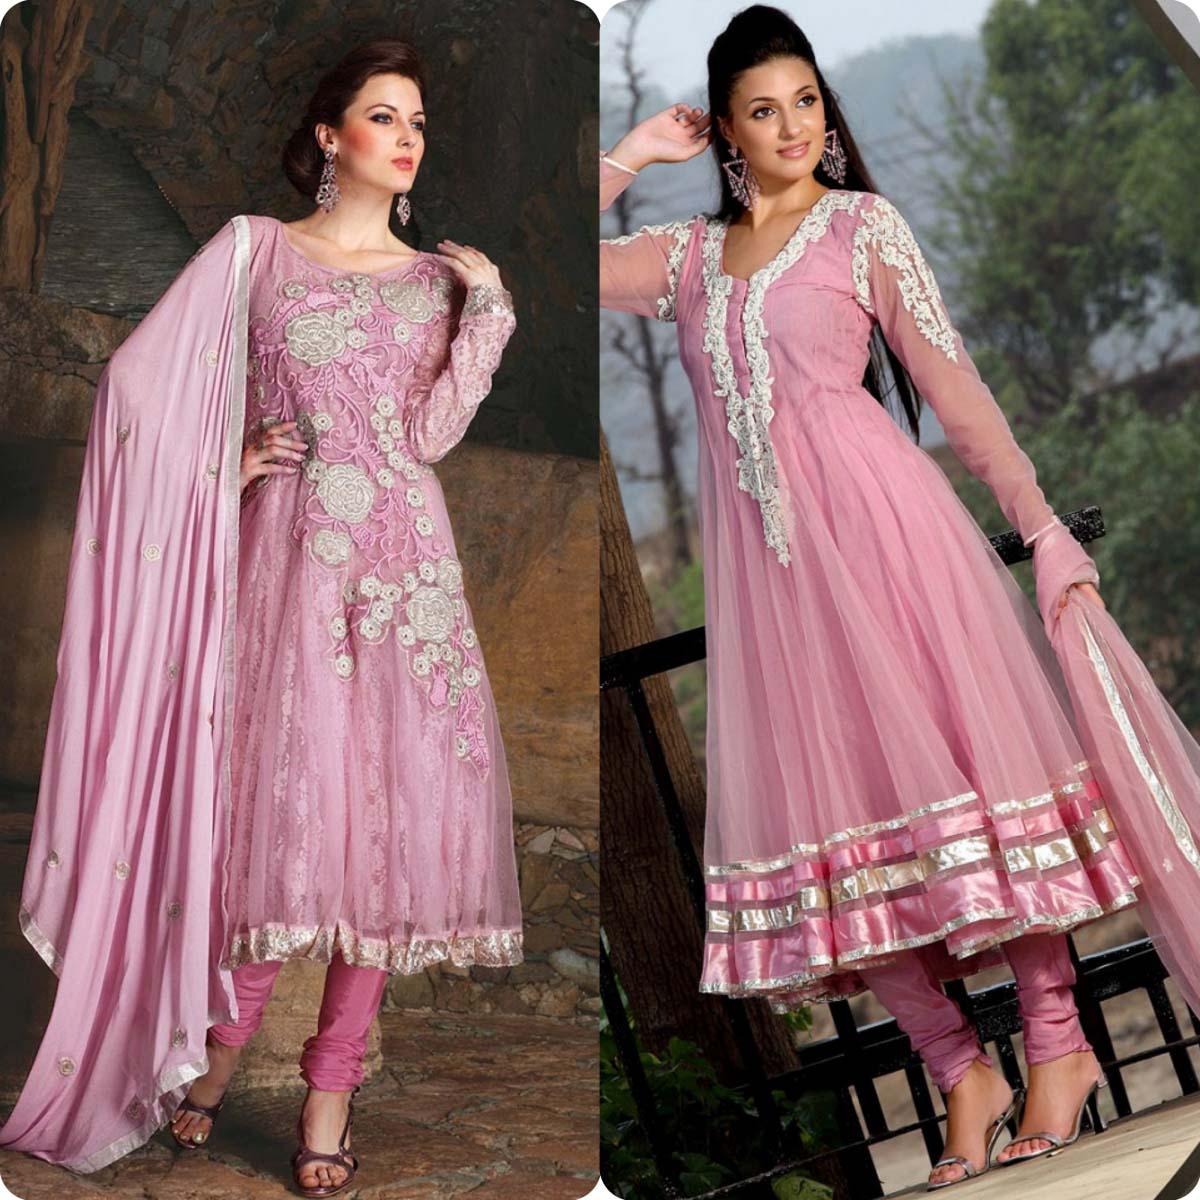 Indian Stylish Umbrella Frock and Churidar Dresses for Girls 2016-2017 (12)